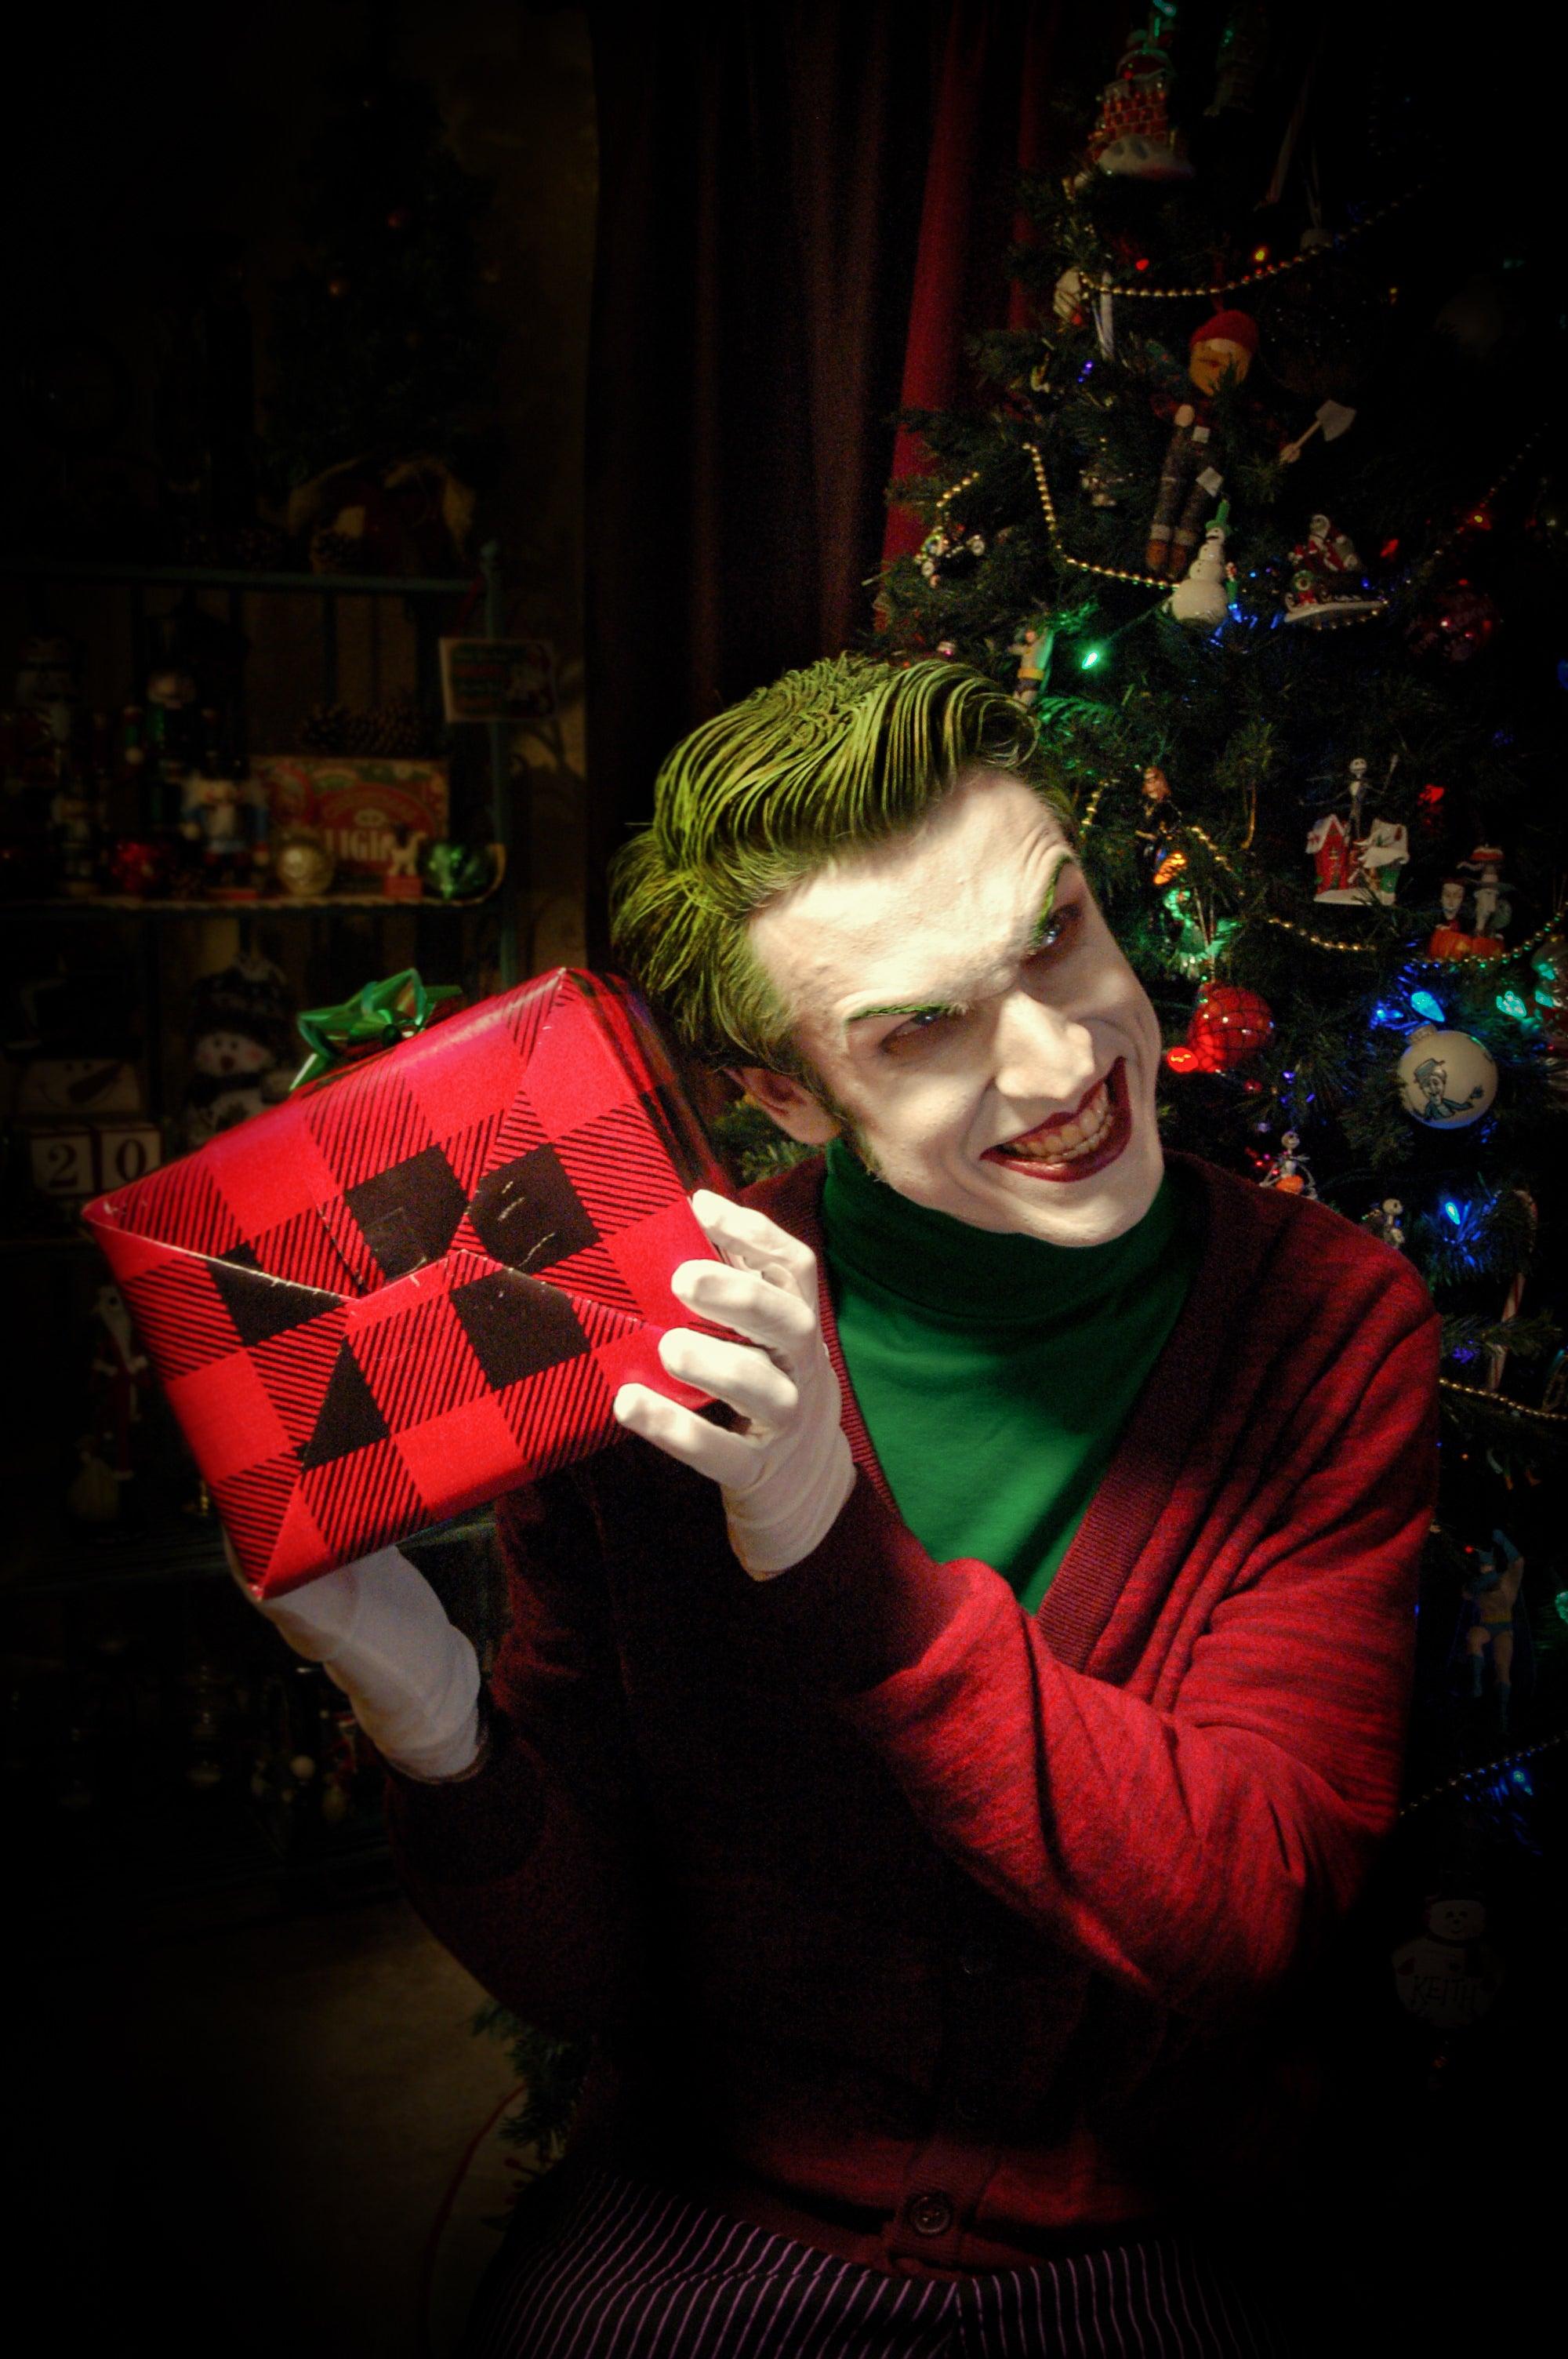 The Joker Wishes You All A Very Scary Christmas | Kotaku Australia